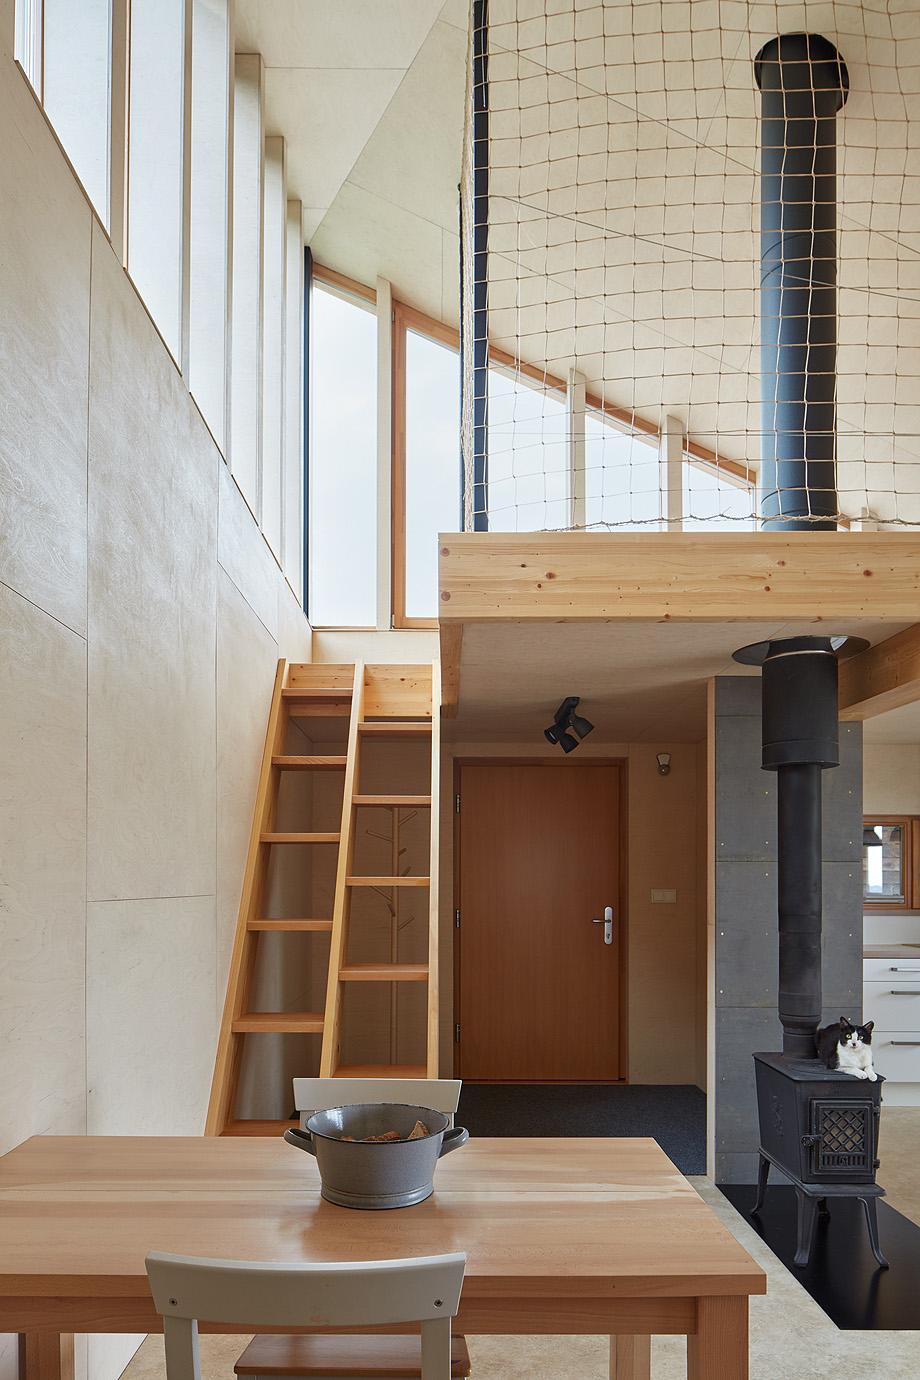 casa chestnut de valarch studio - foto boysplaynice (6)